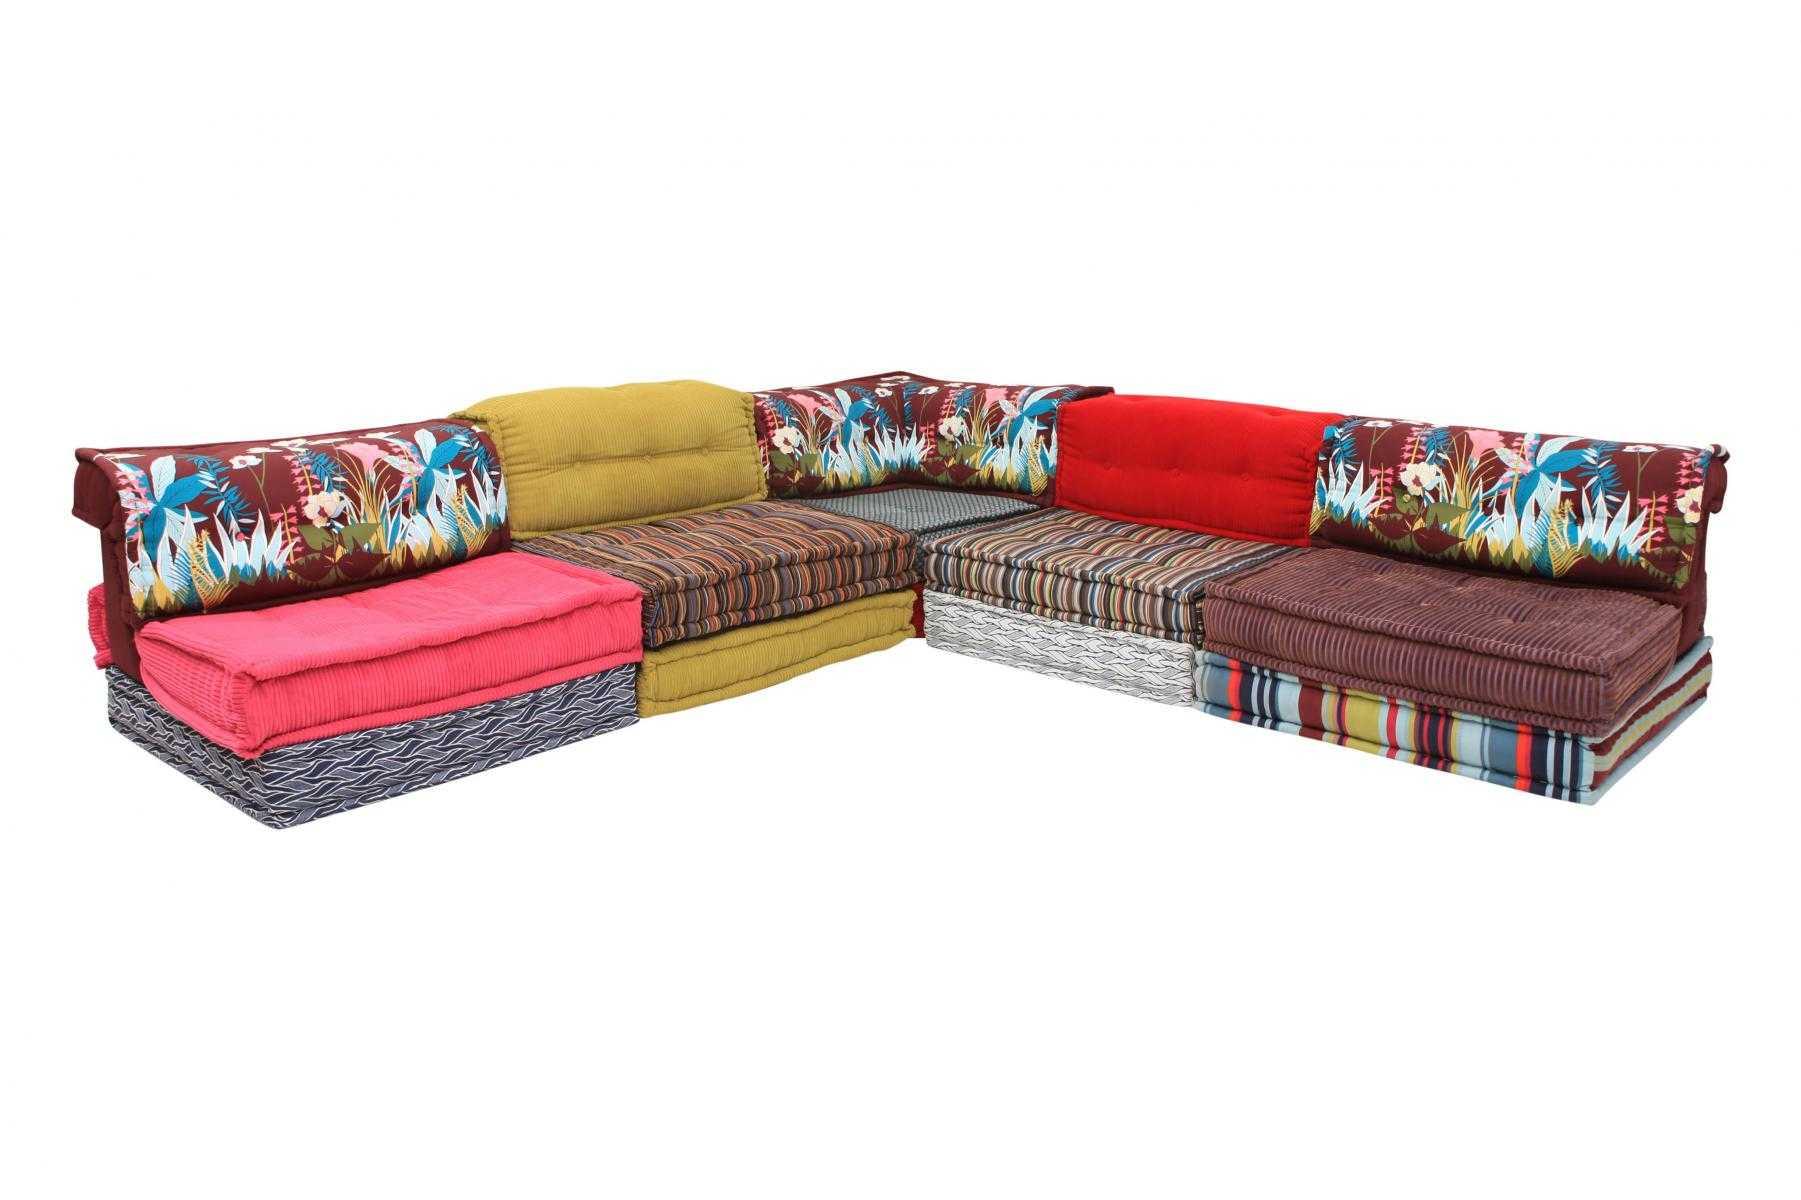 roche bobois mah jong modular sofa preis sectional sofas contemporary online shop buy furniture lighting design